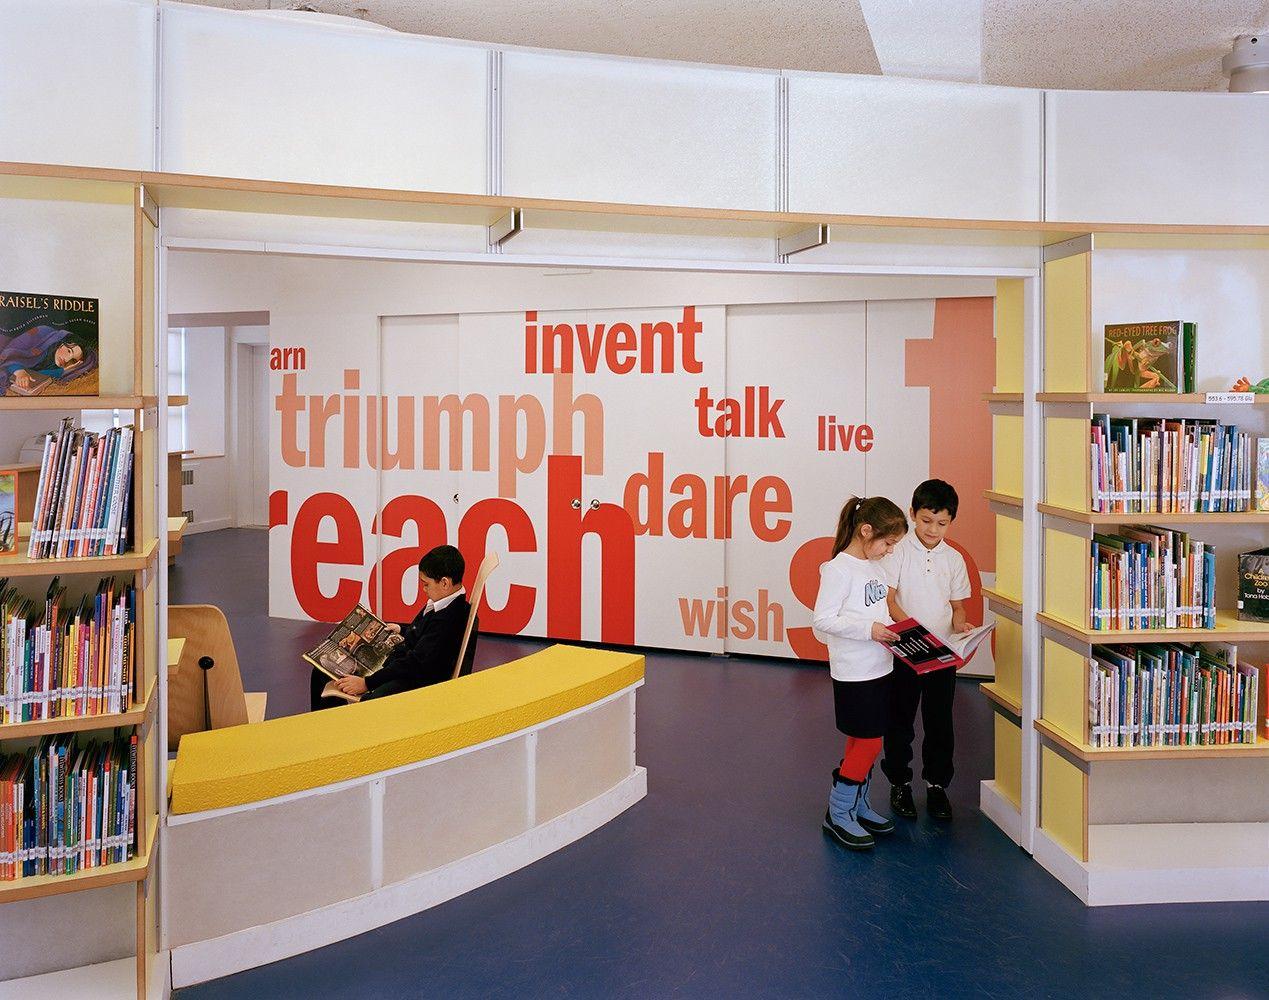 Robin Hood Lbrary Initiative   10 Architect   School library ...